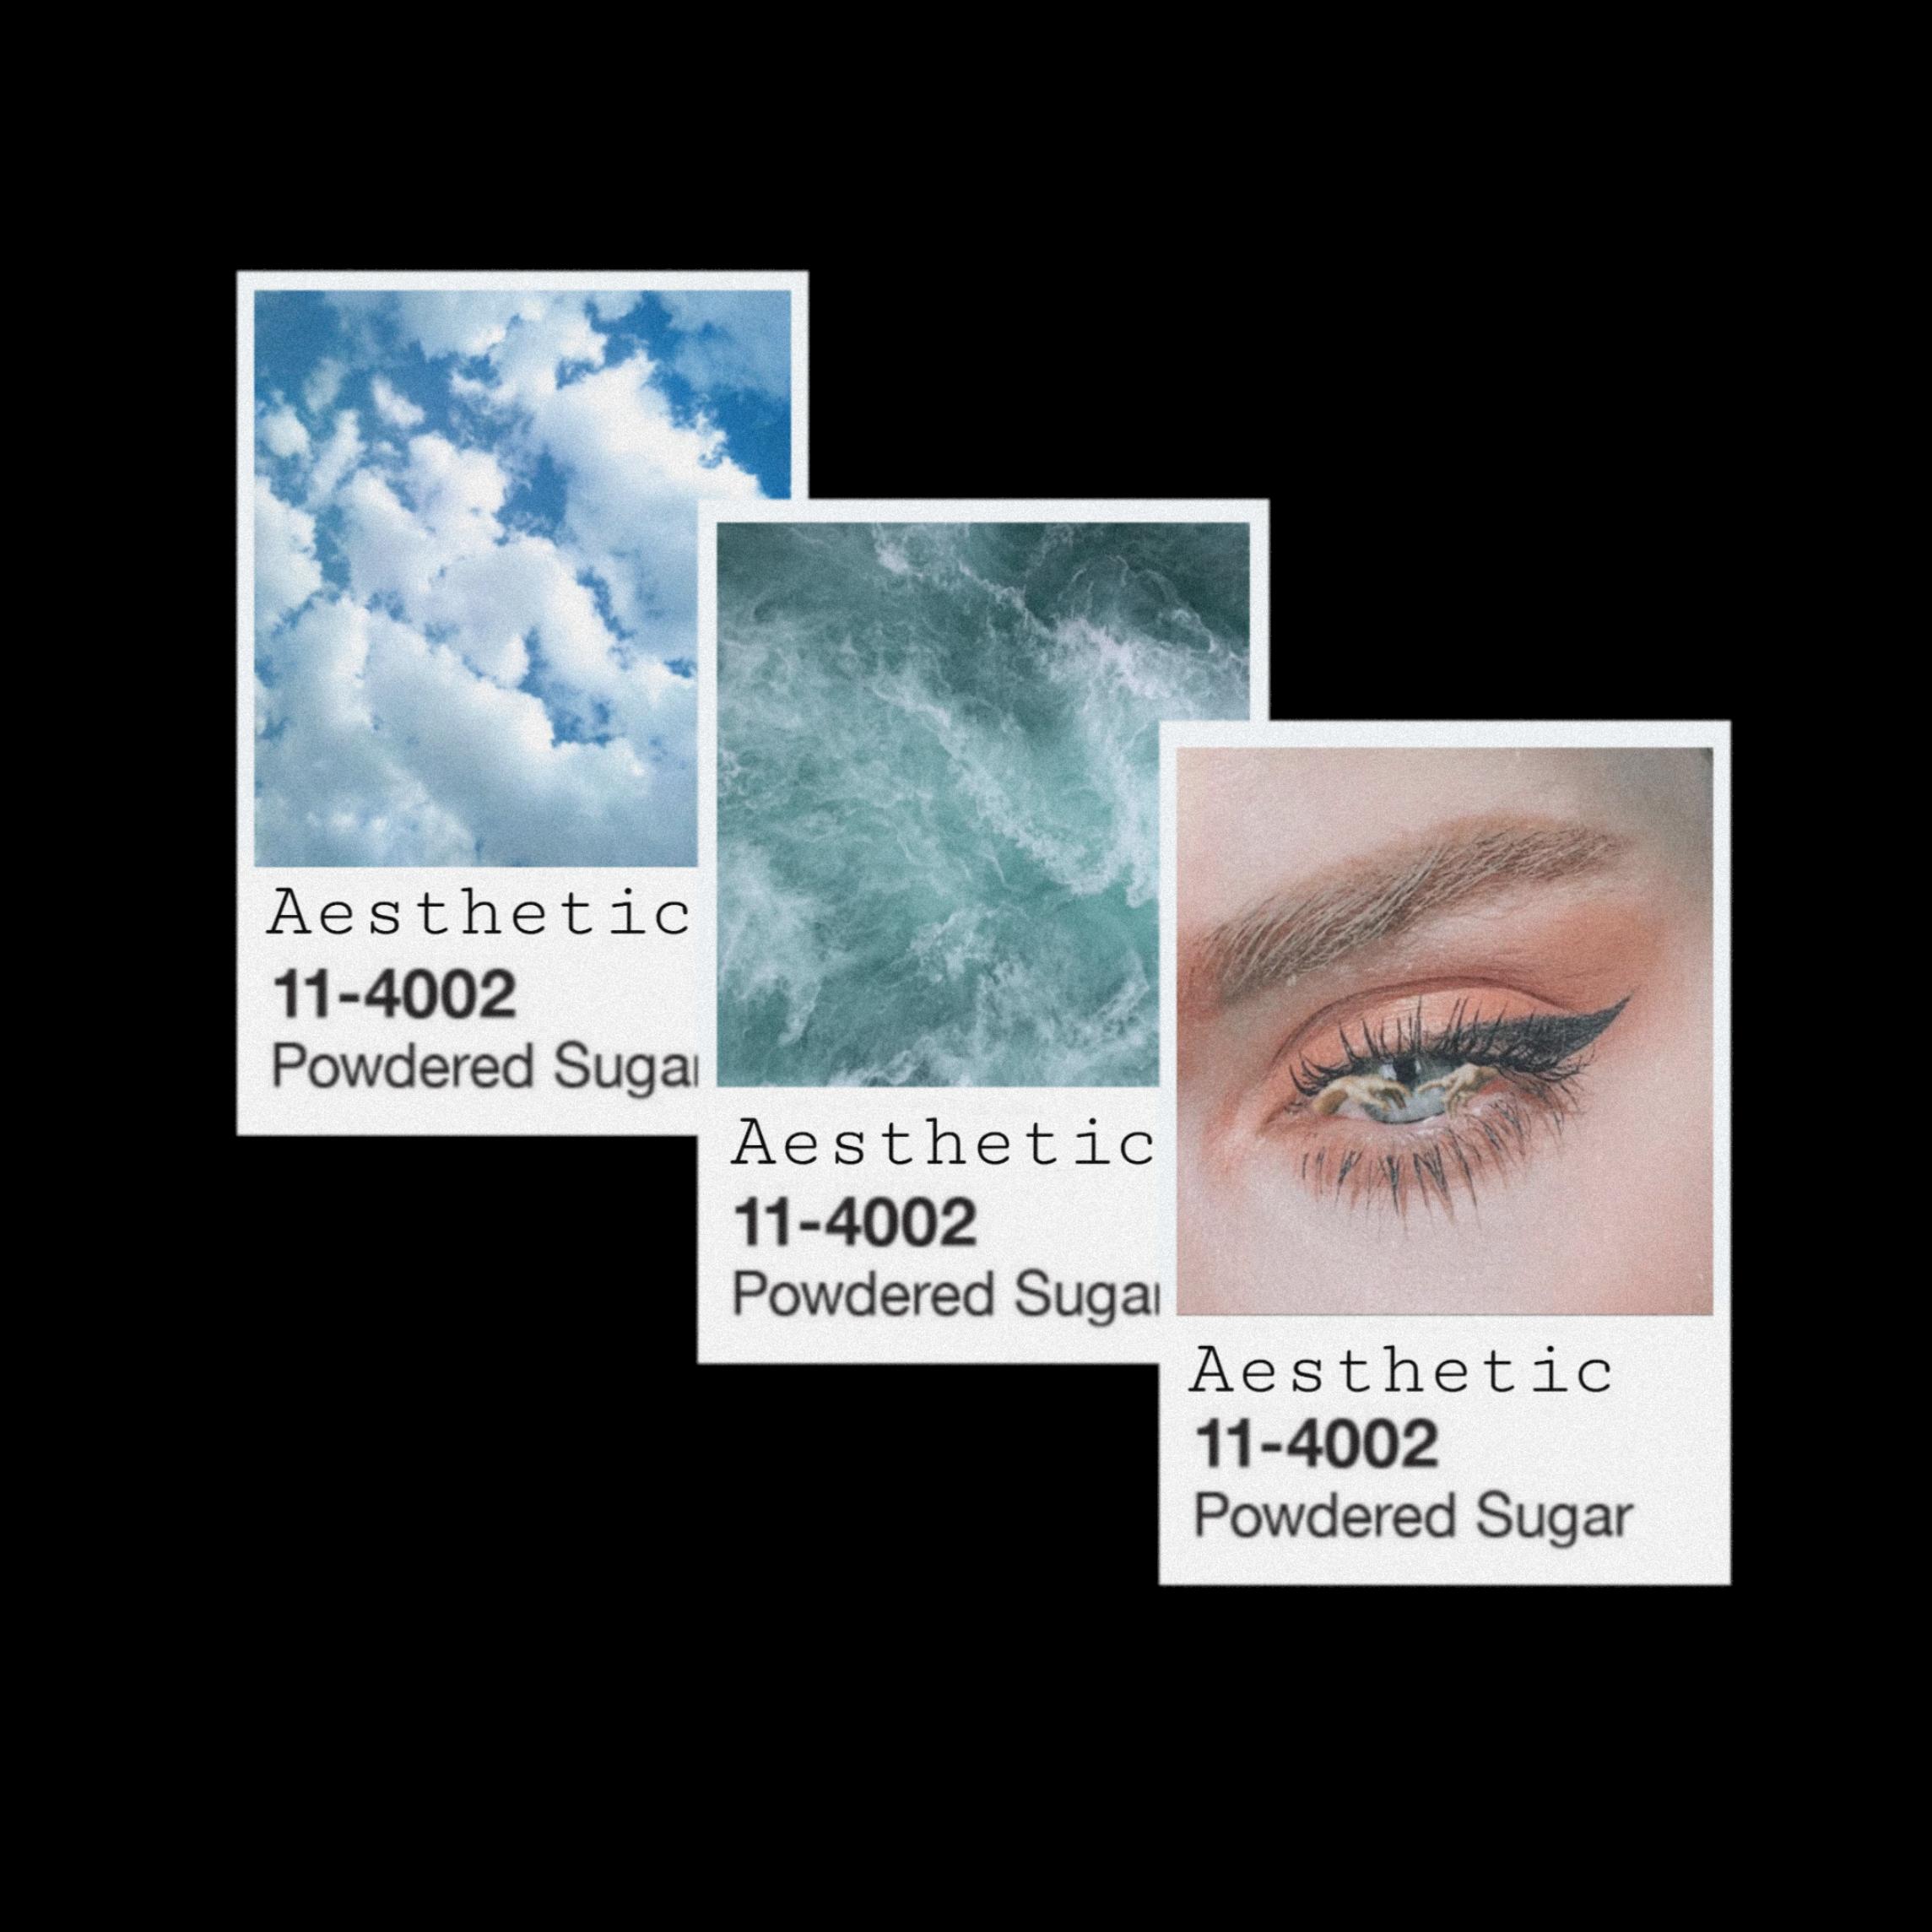 Freetoedit Mysticker Aesthetic Aesthetics Soft Grungeaesthetic Tumblr Vintage Aesthetictumblr Gru In 2020 Aesthetic Eyes Aesthetic Stickers Overlays Instagram